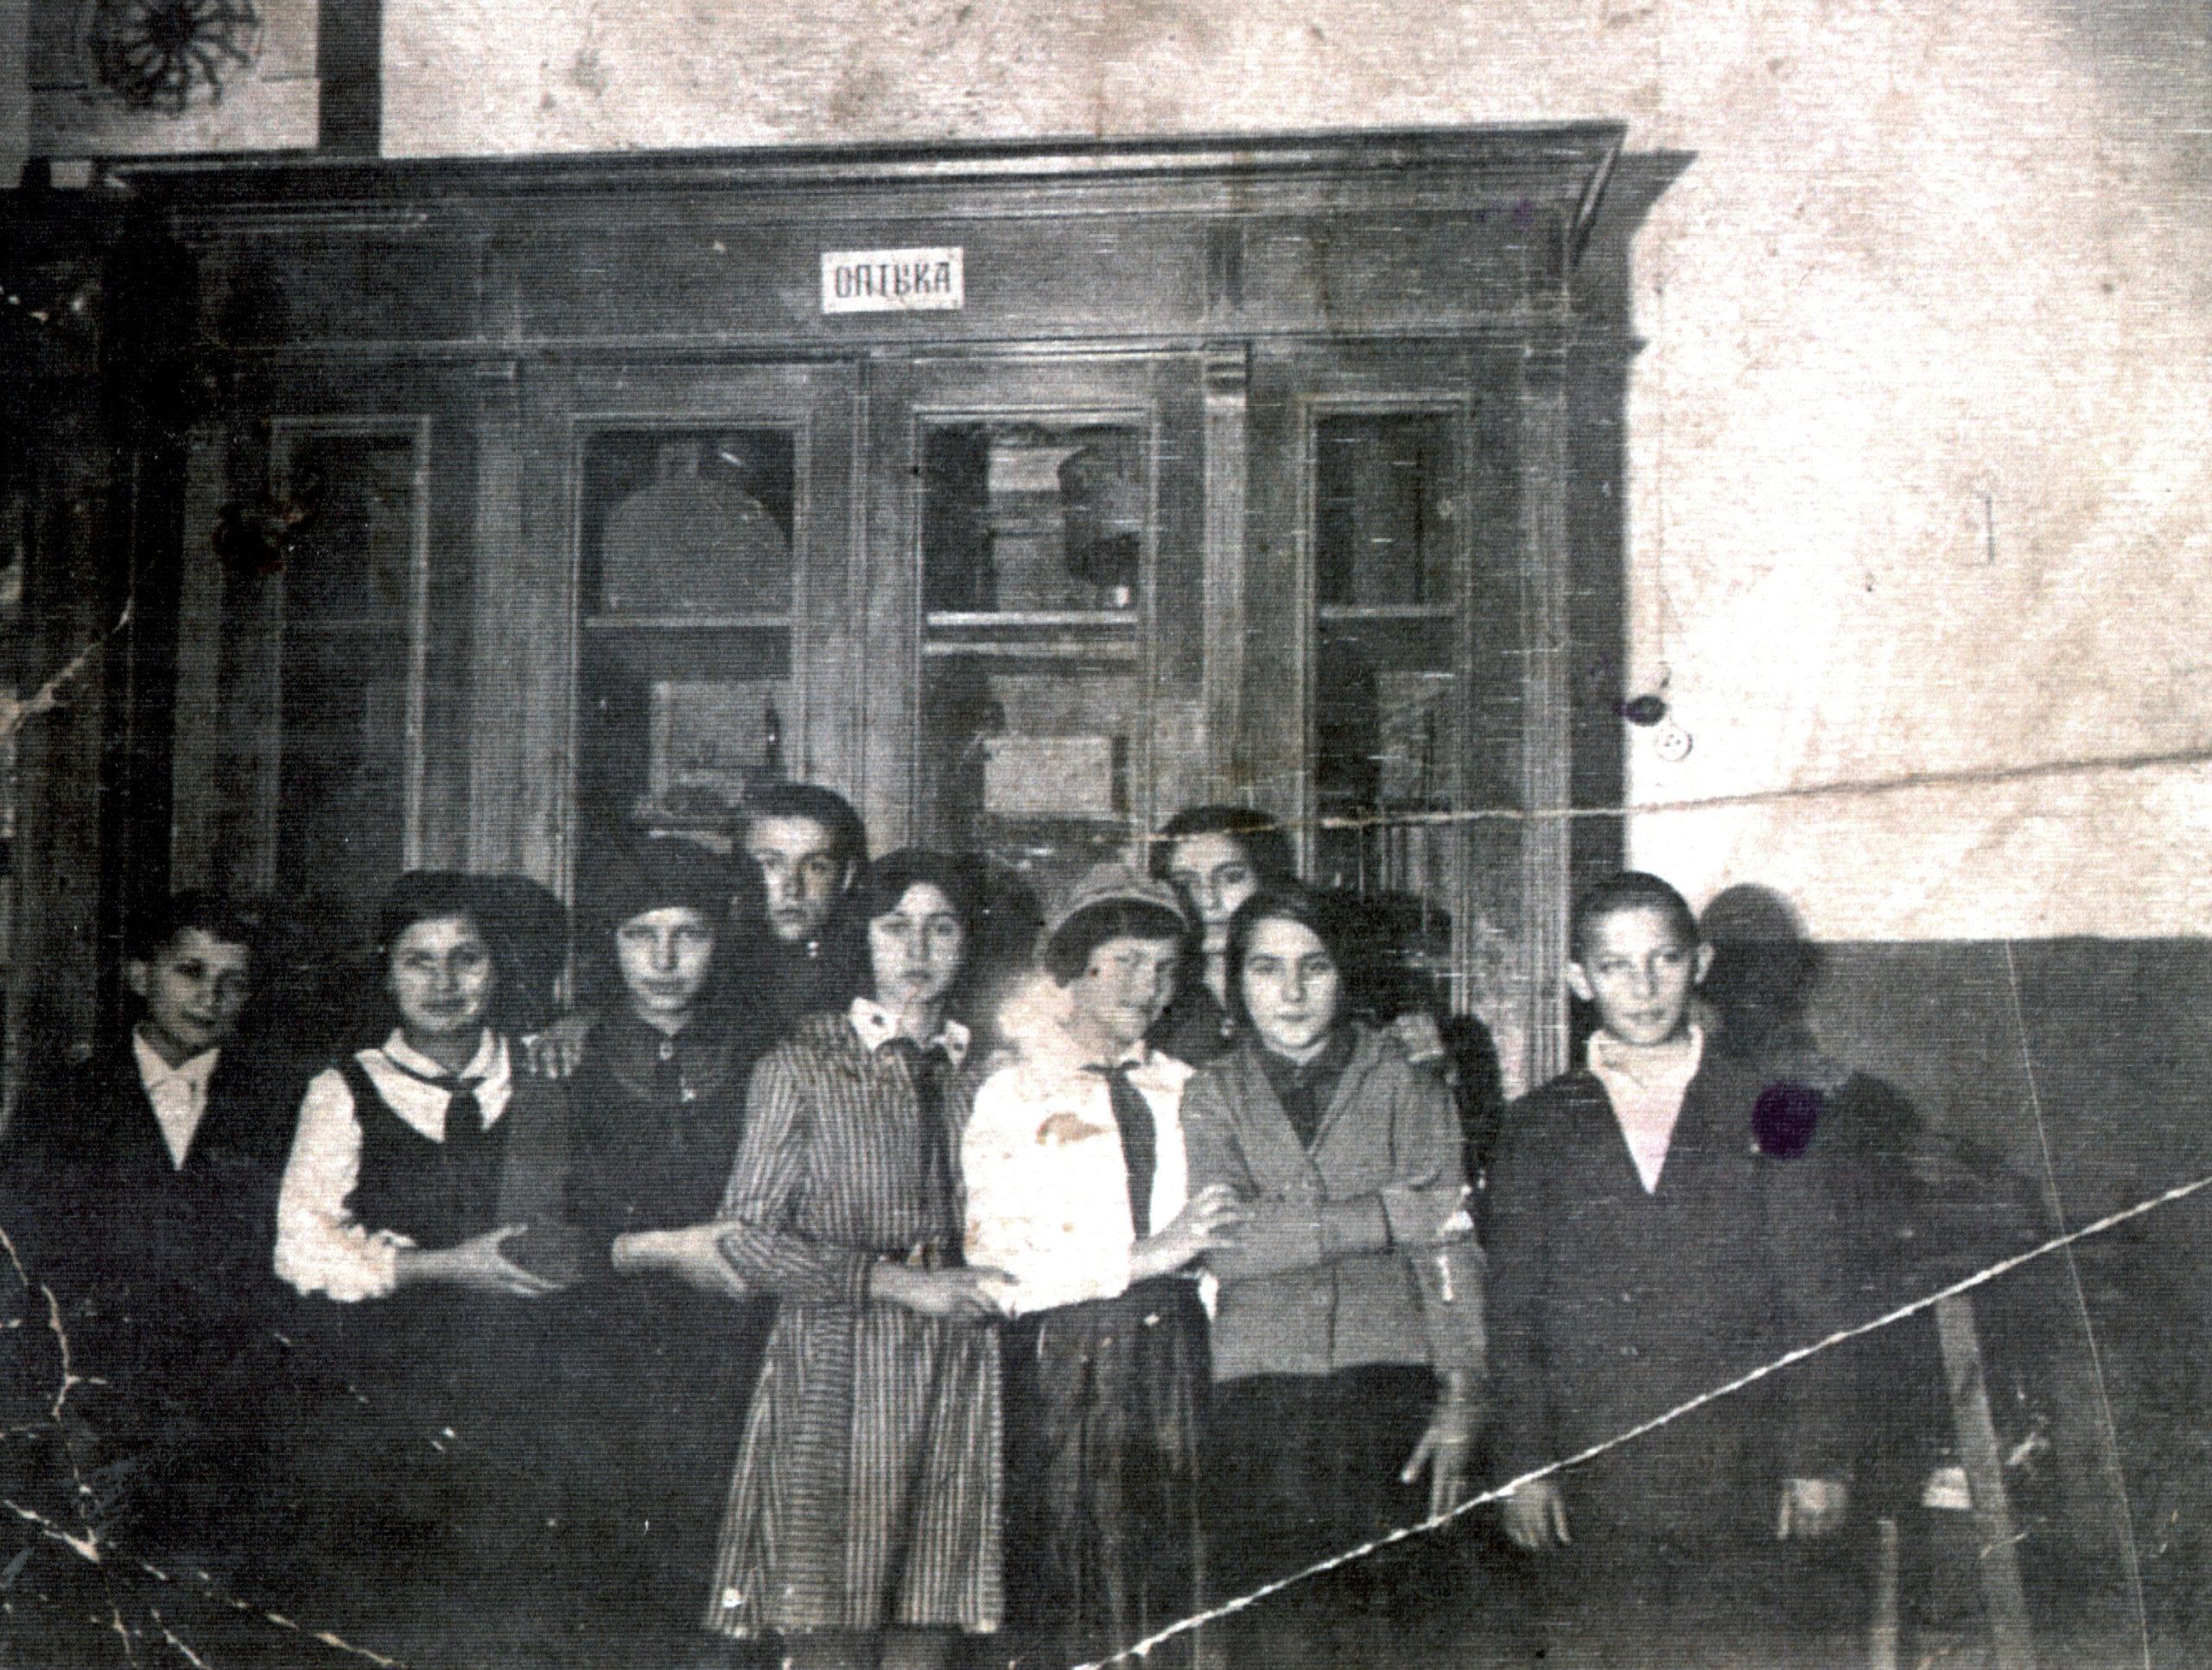 Efim Pisarenko's sister Broha Shapiro and her fellow students